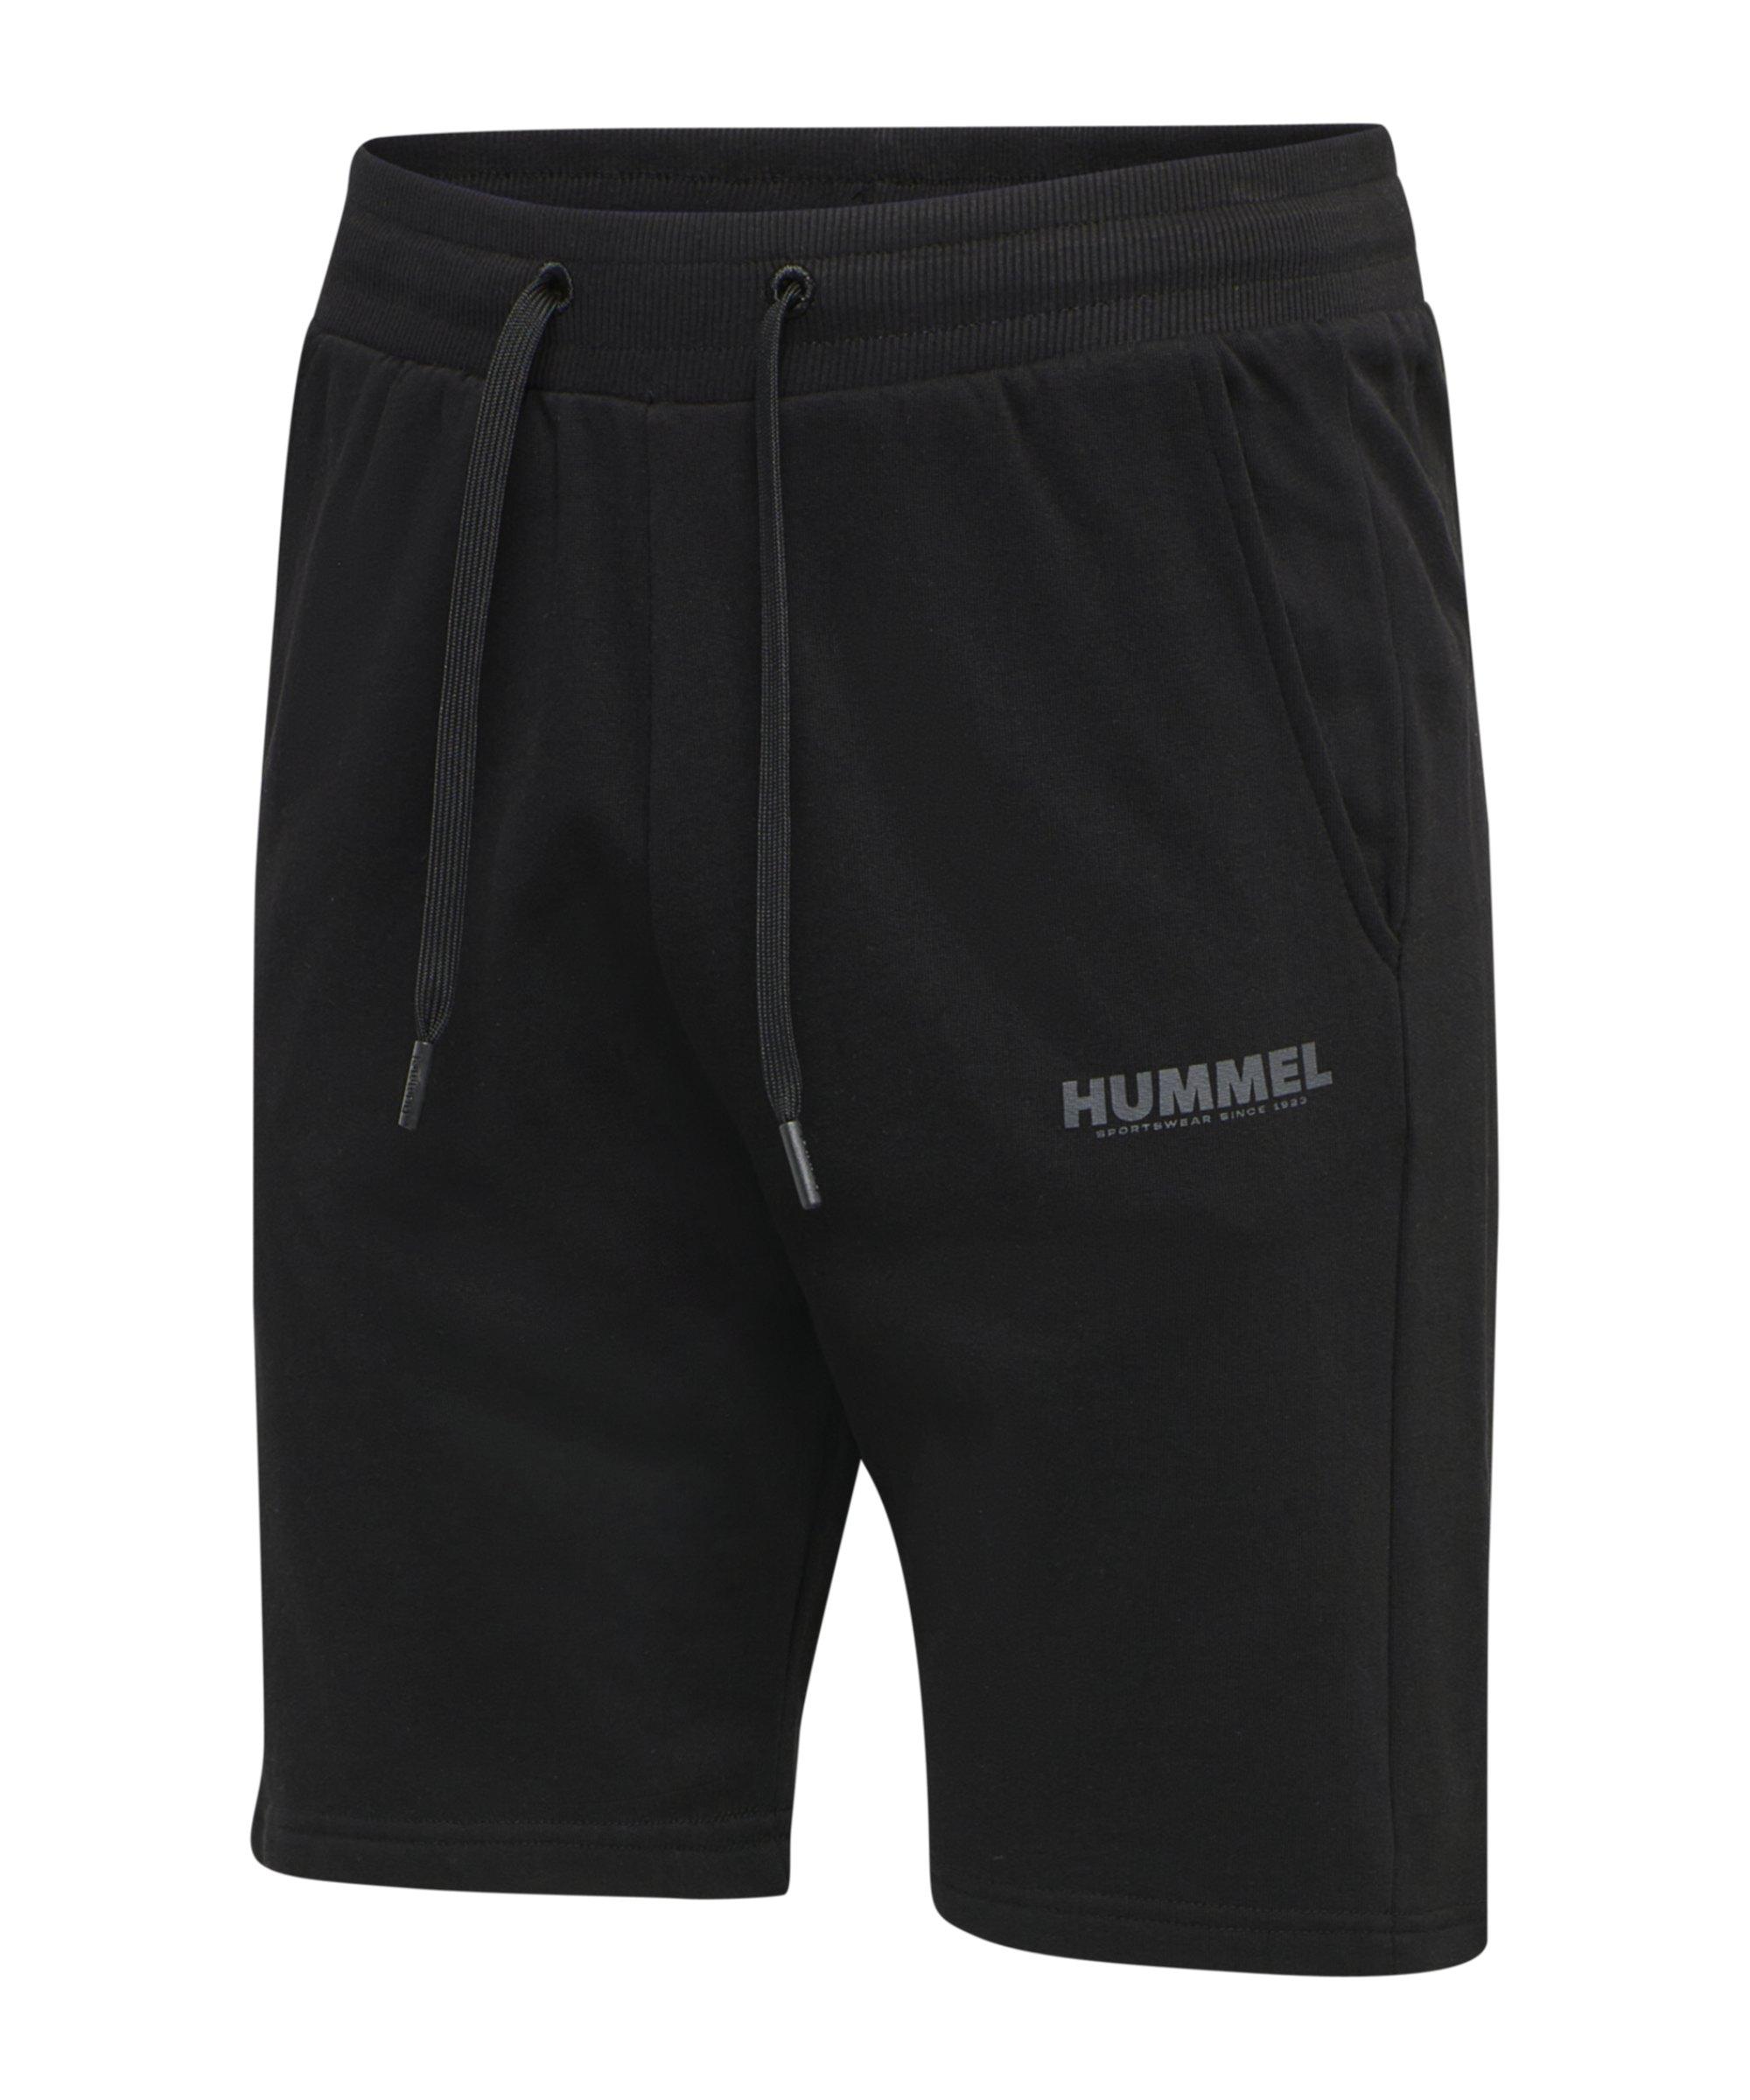 Hummel Legacy Short Schwarz F2001 - schwarz